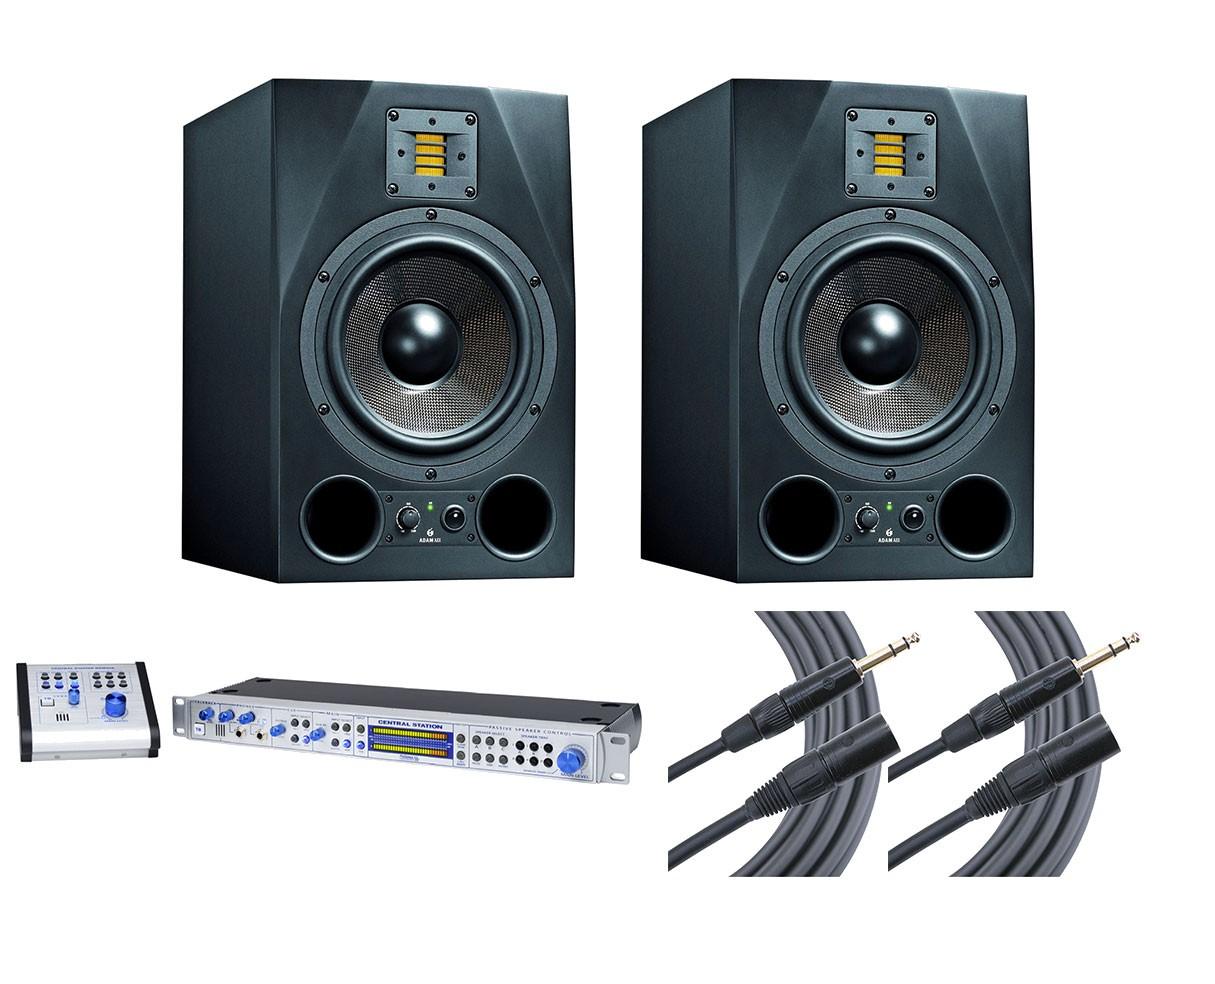 2x ADAM A8X + Central Station PLUS + Mogami Cables